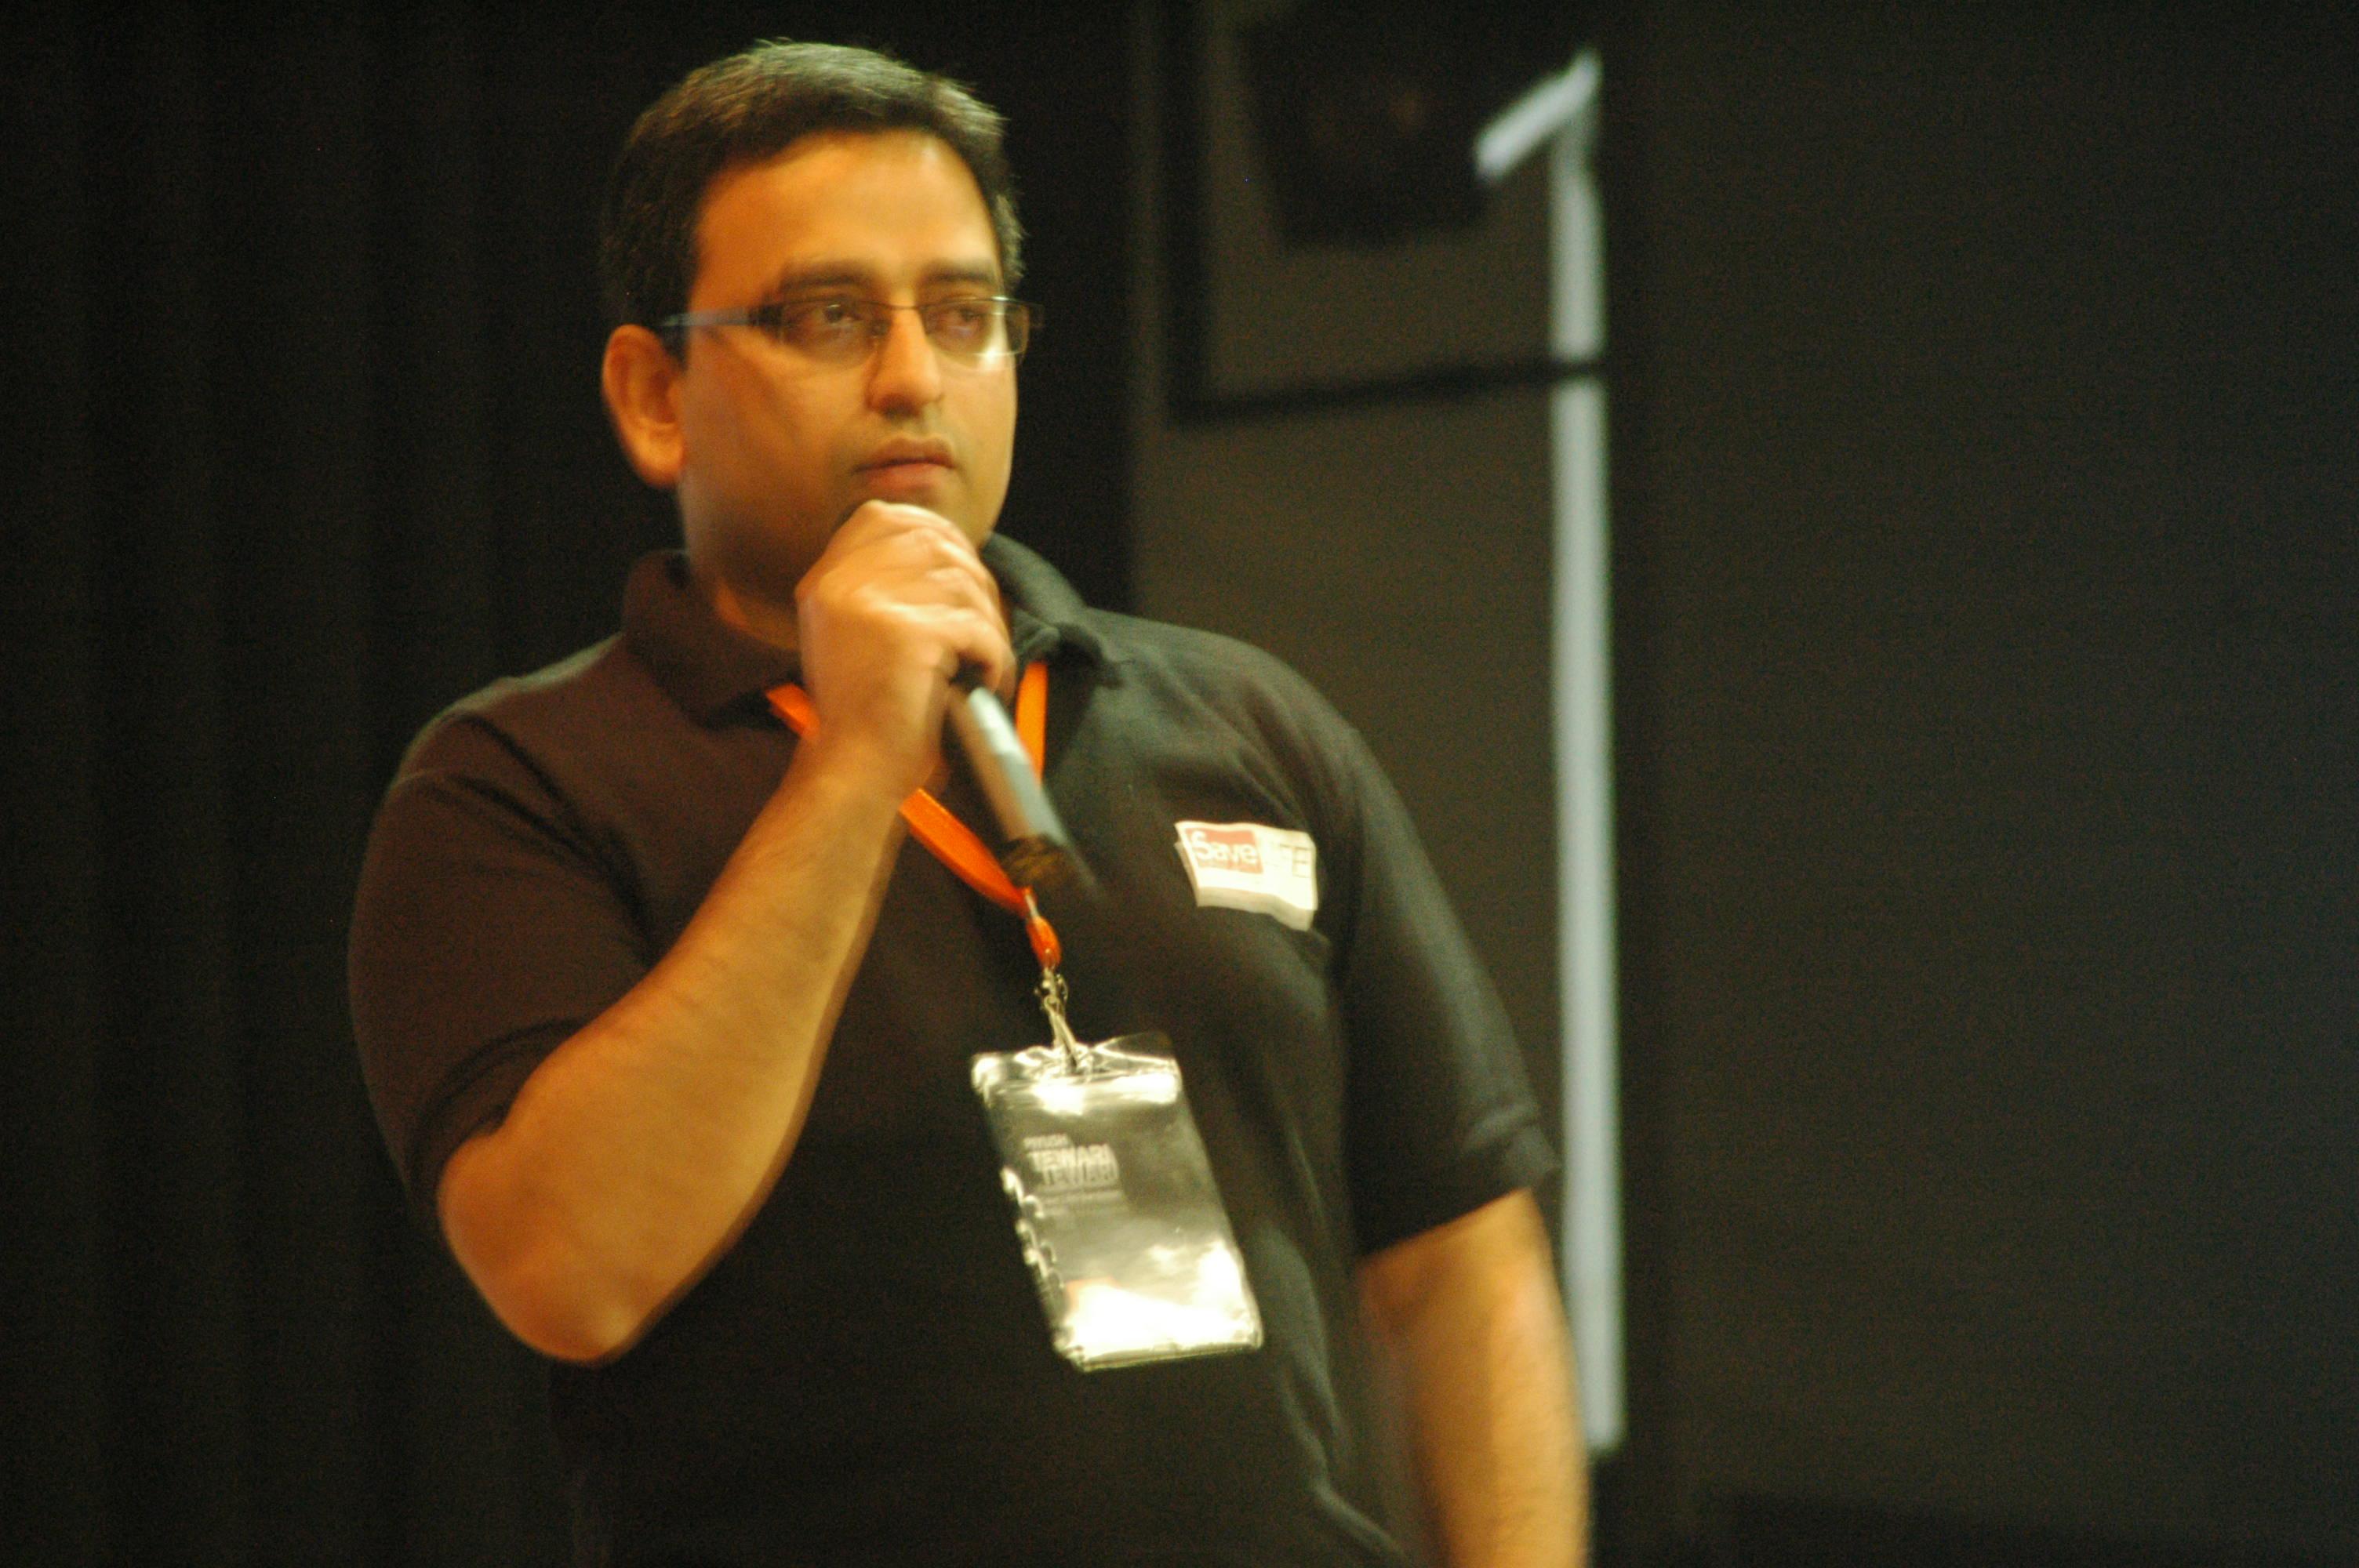 Piyush Tiwari, founder, Save Life foundation